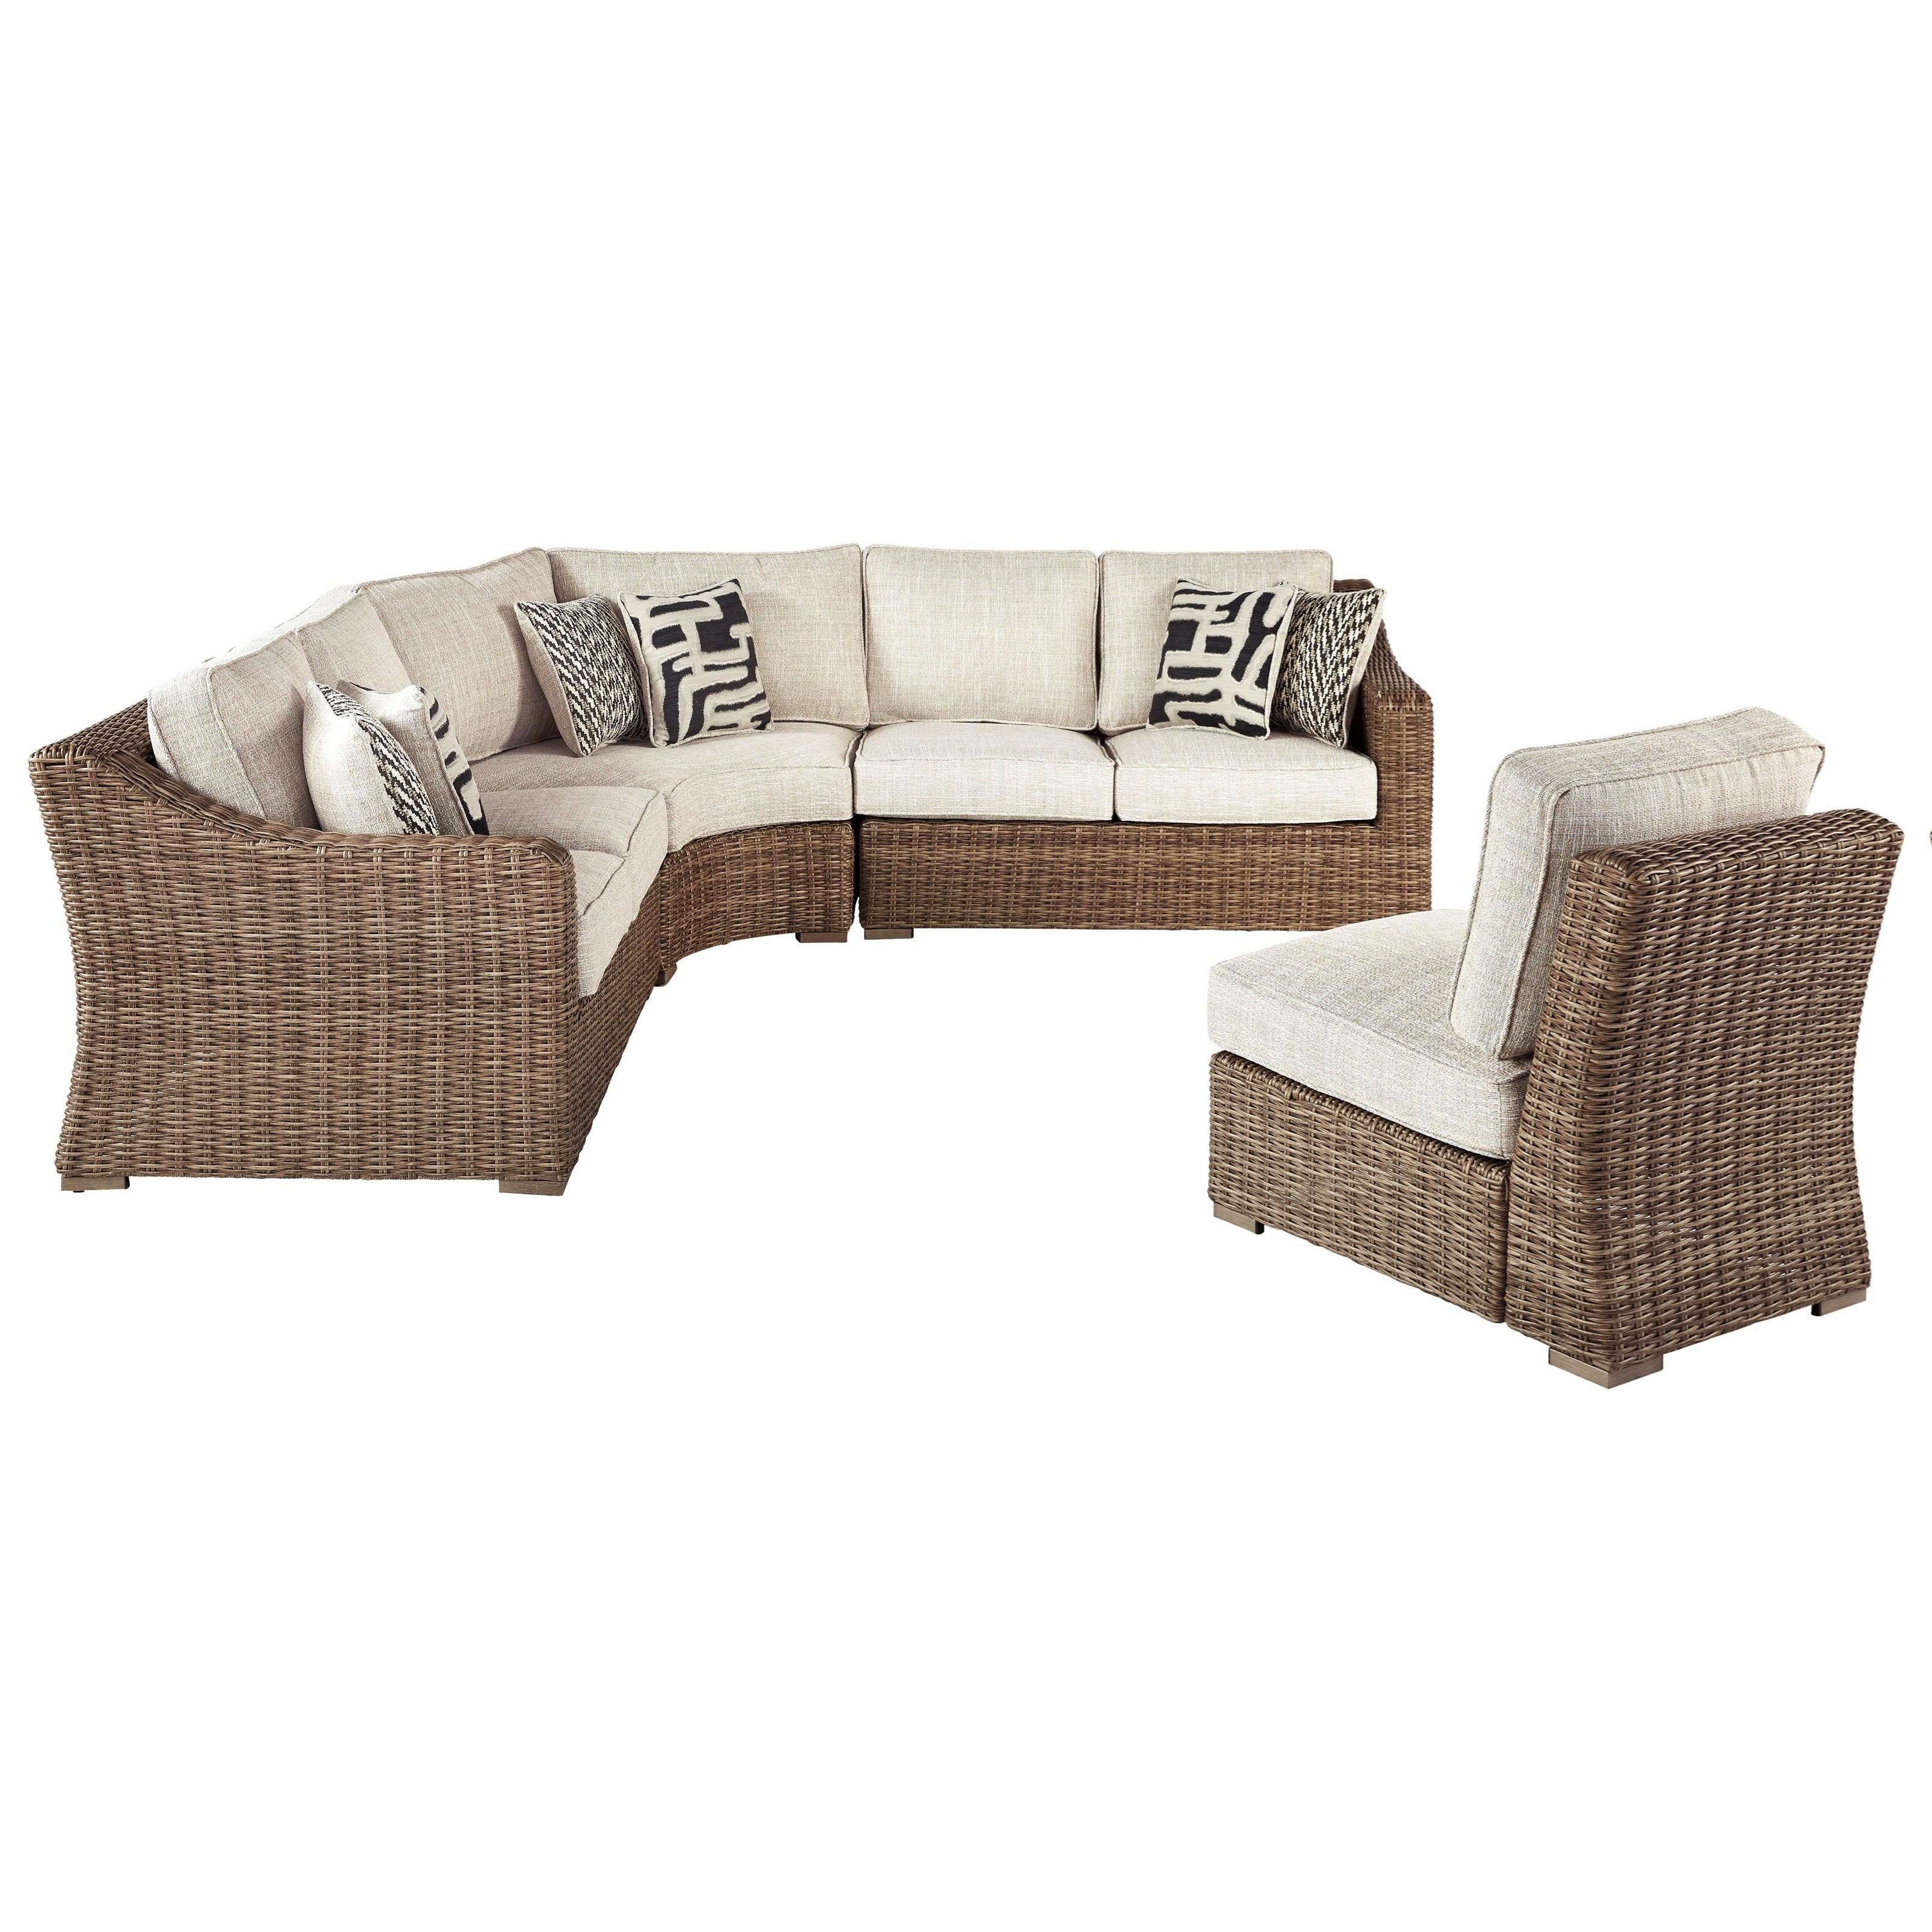 Levitz Furniture Store Locations: Signature Design By Ashley Beachcroft 4 Piece Resin Wicker